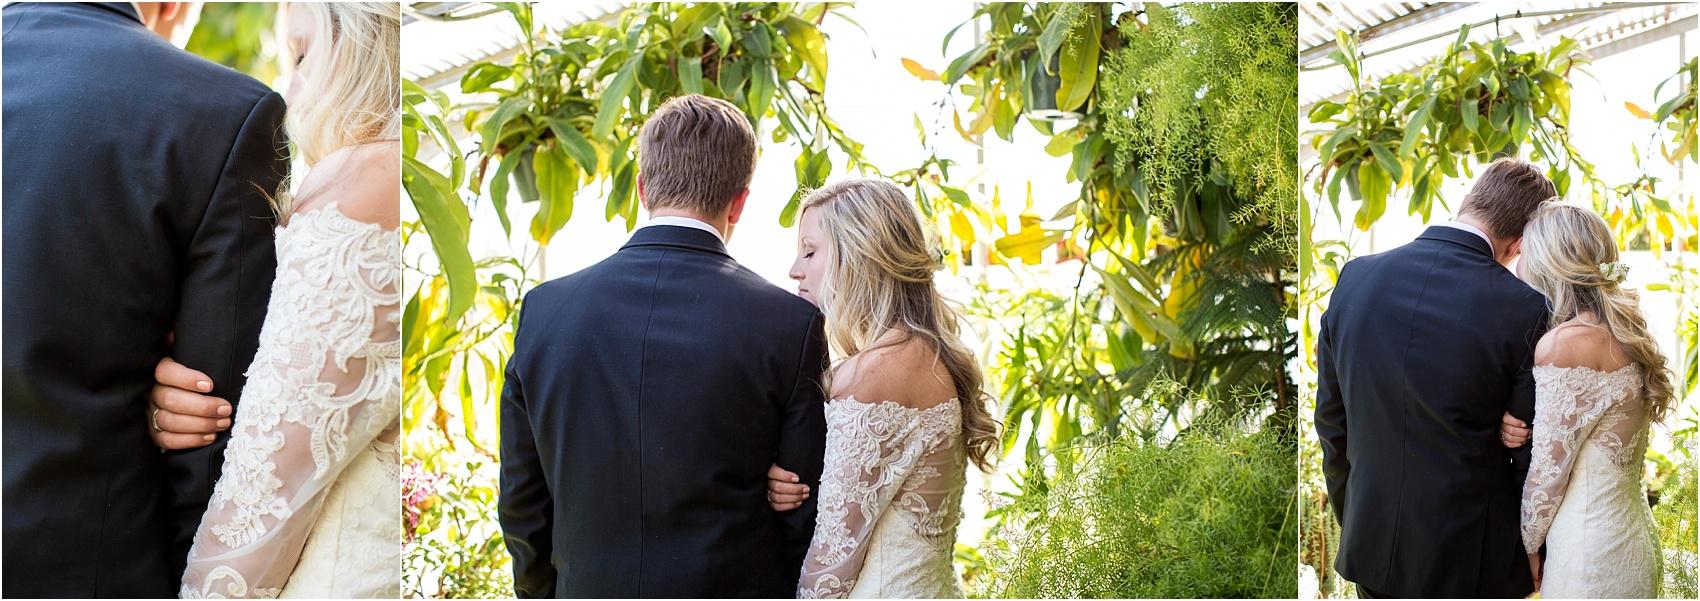 Bethune Wedding- Highlights-6.jpg